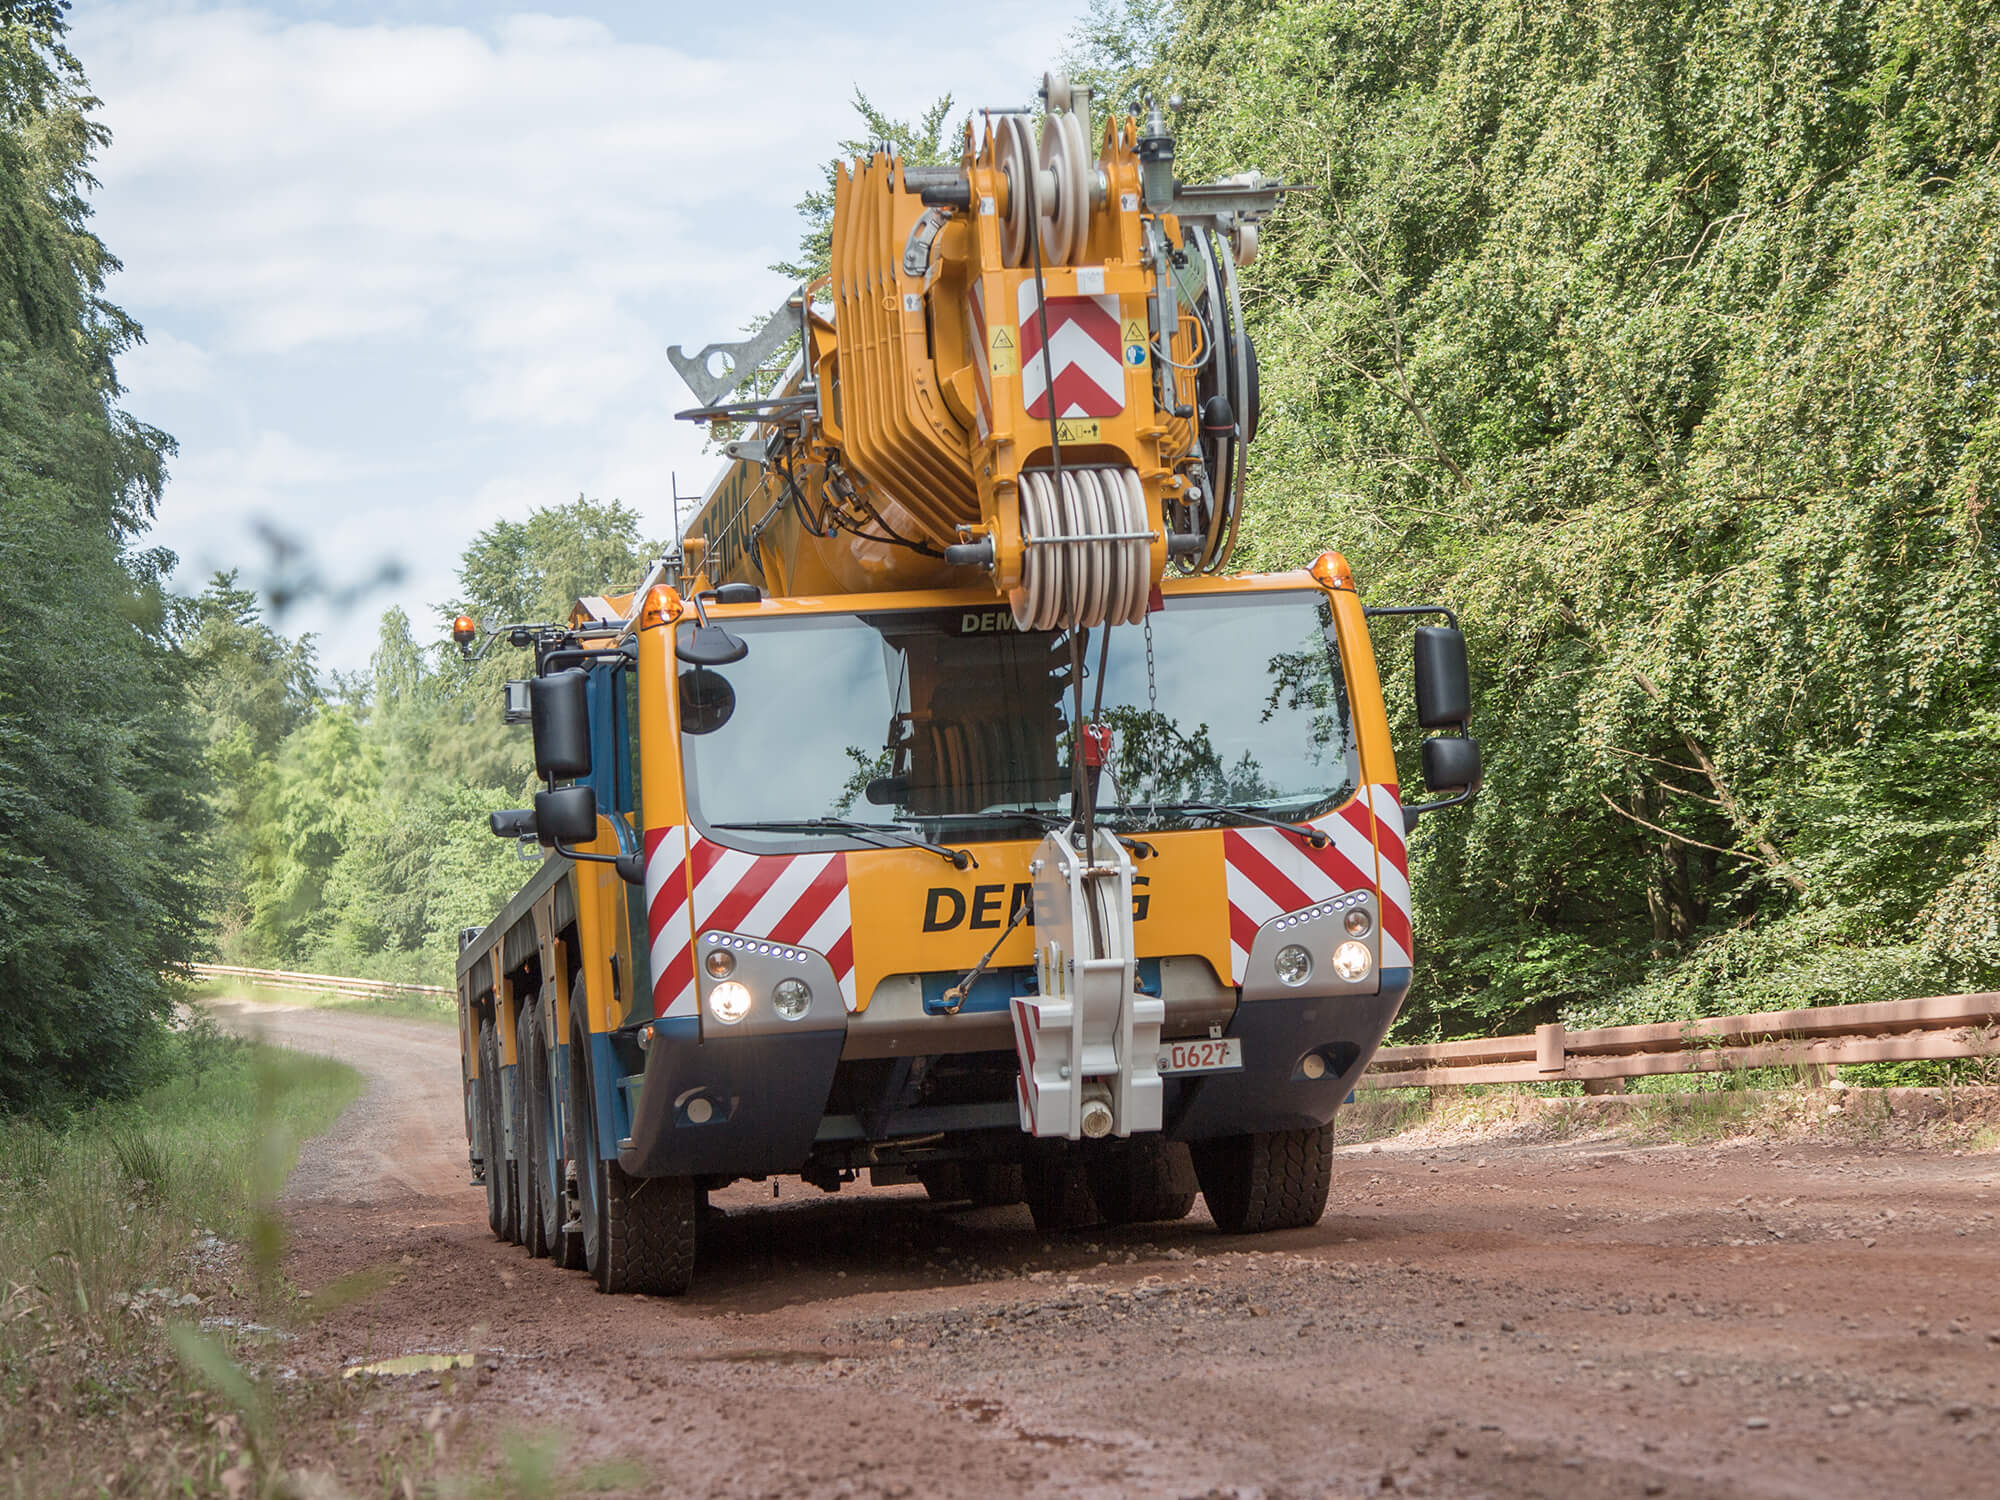 Demag all terrain crane for sale